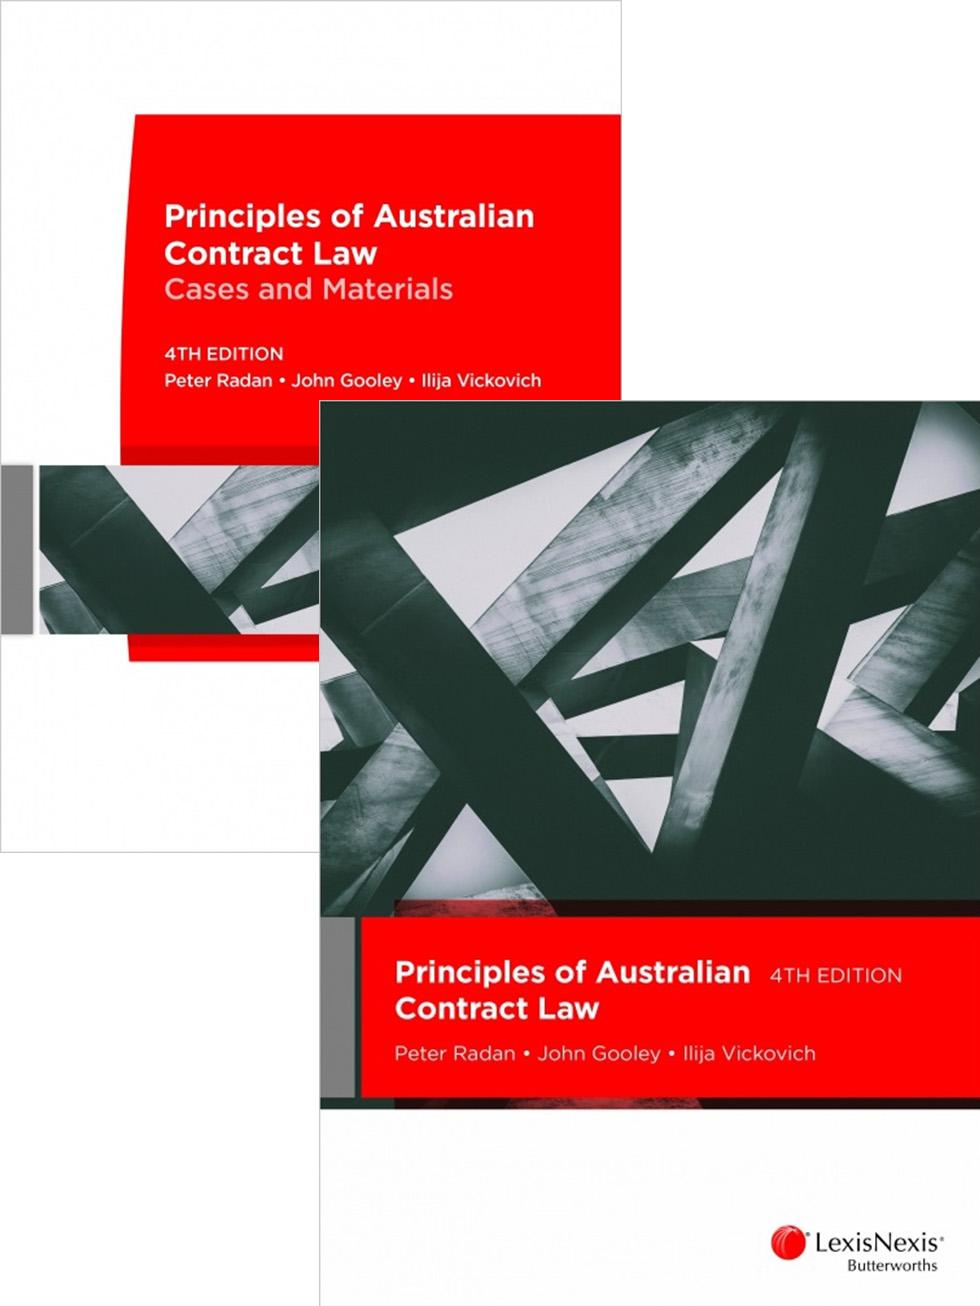 Principles of Australian Contract Law 4E + Principles of Australian Contract Law Cases and Materials 4E